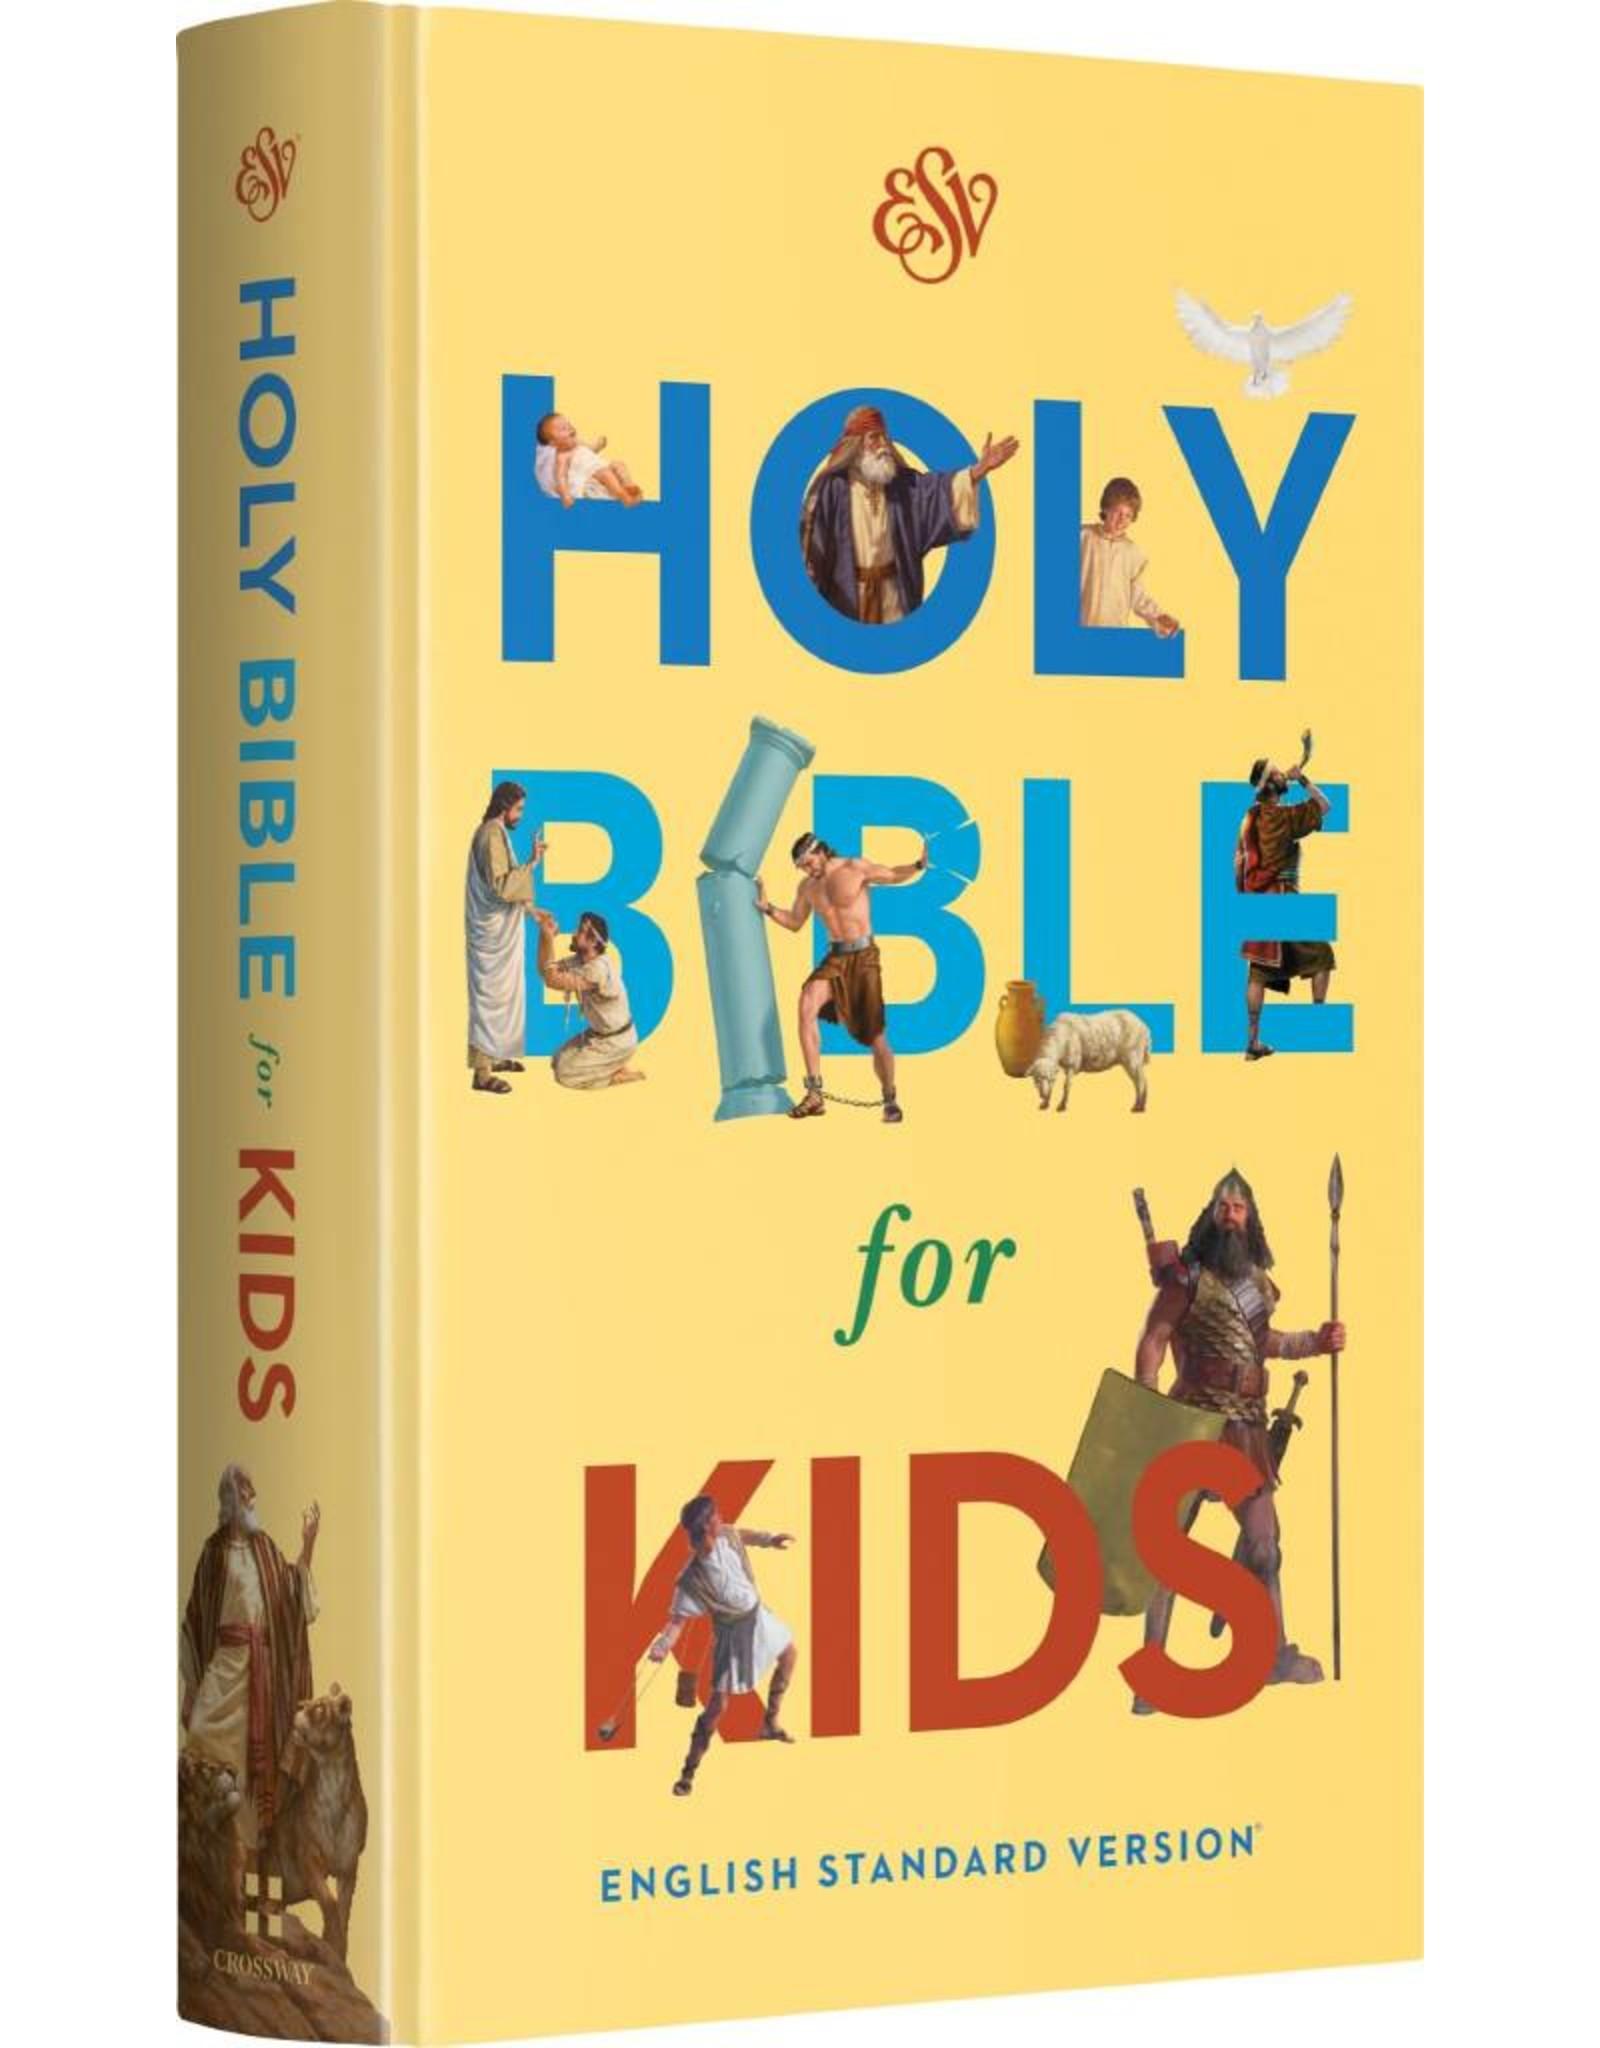 Crossway / Good News ESV Holy Bible for Kids